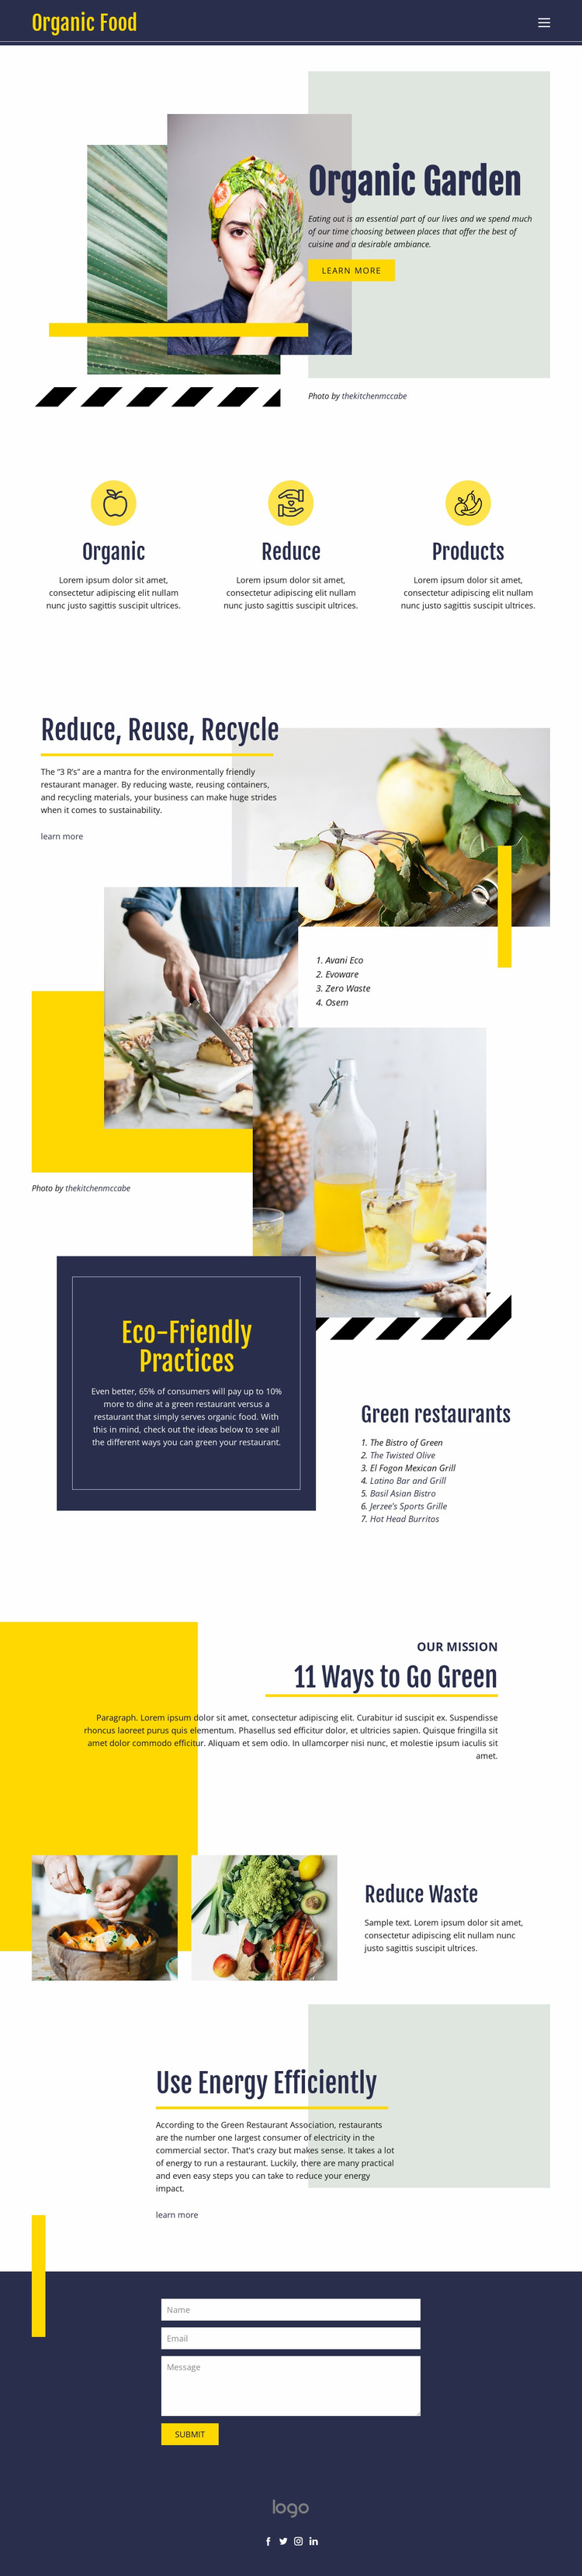 Organic natural food Website Design